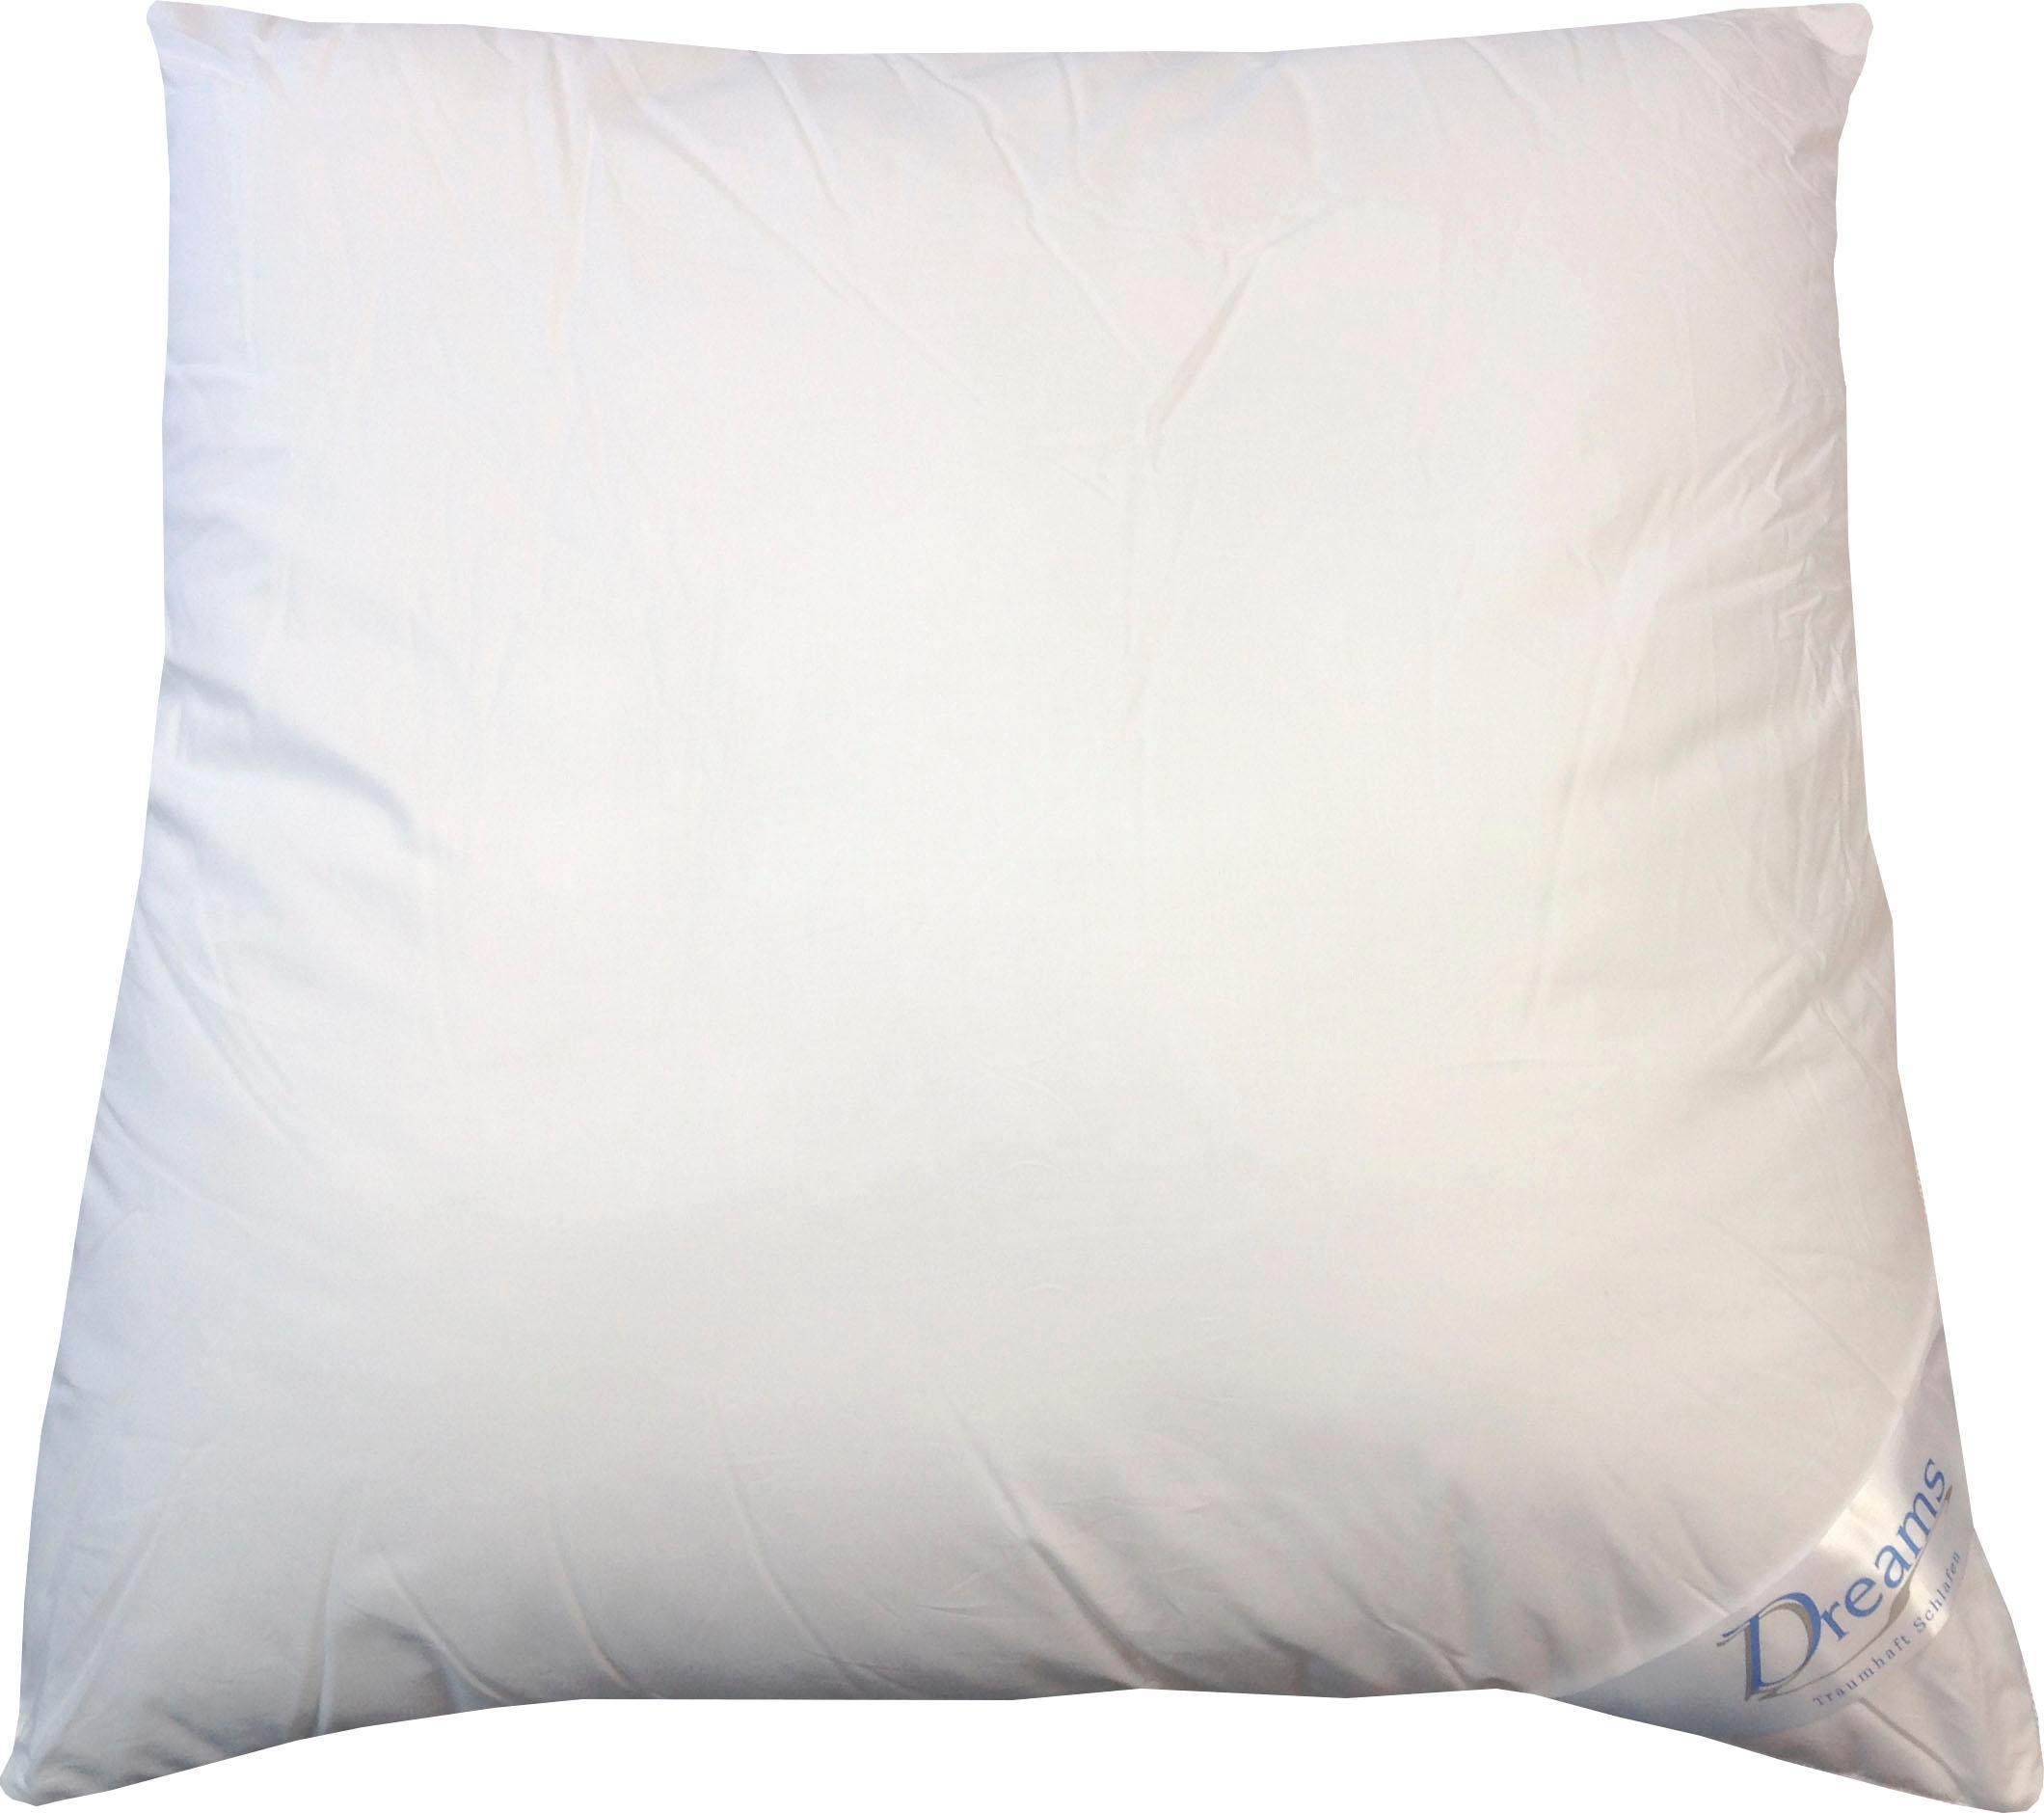 3-Kammer-Kopfkissen, »3-Kammer-Kissen Luxus«, Dreams, Bezug: 100% Baumwolle, (1-tlg.)